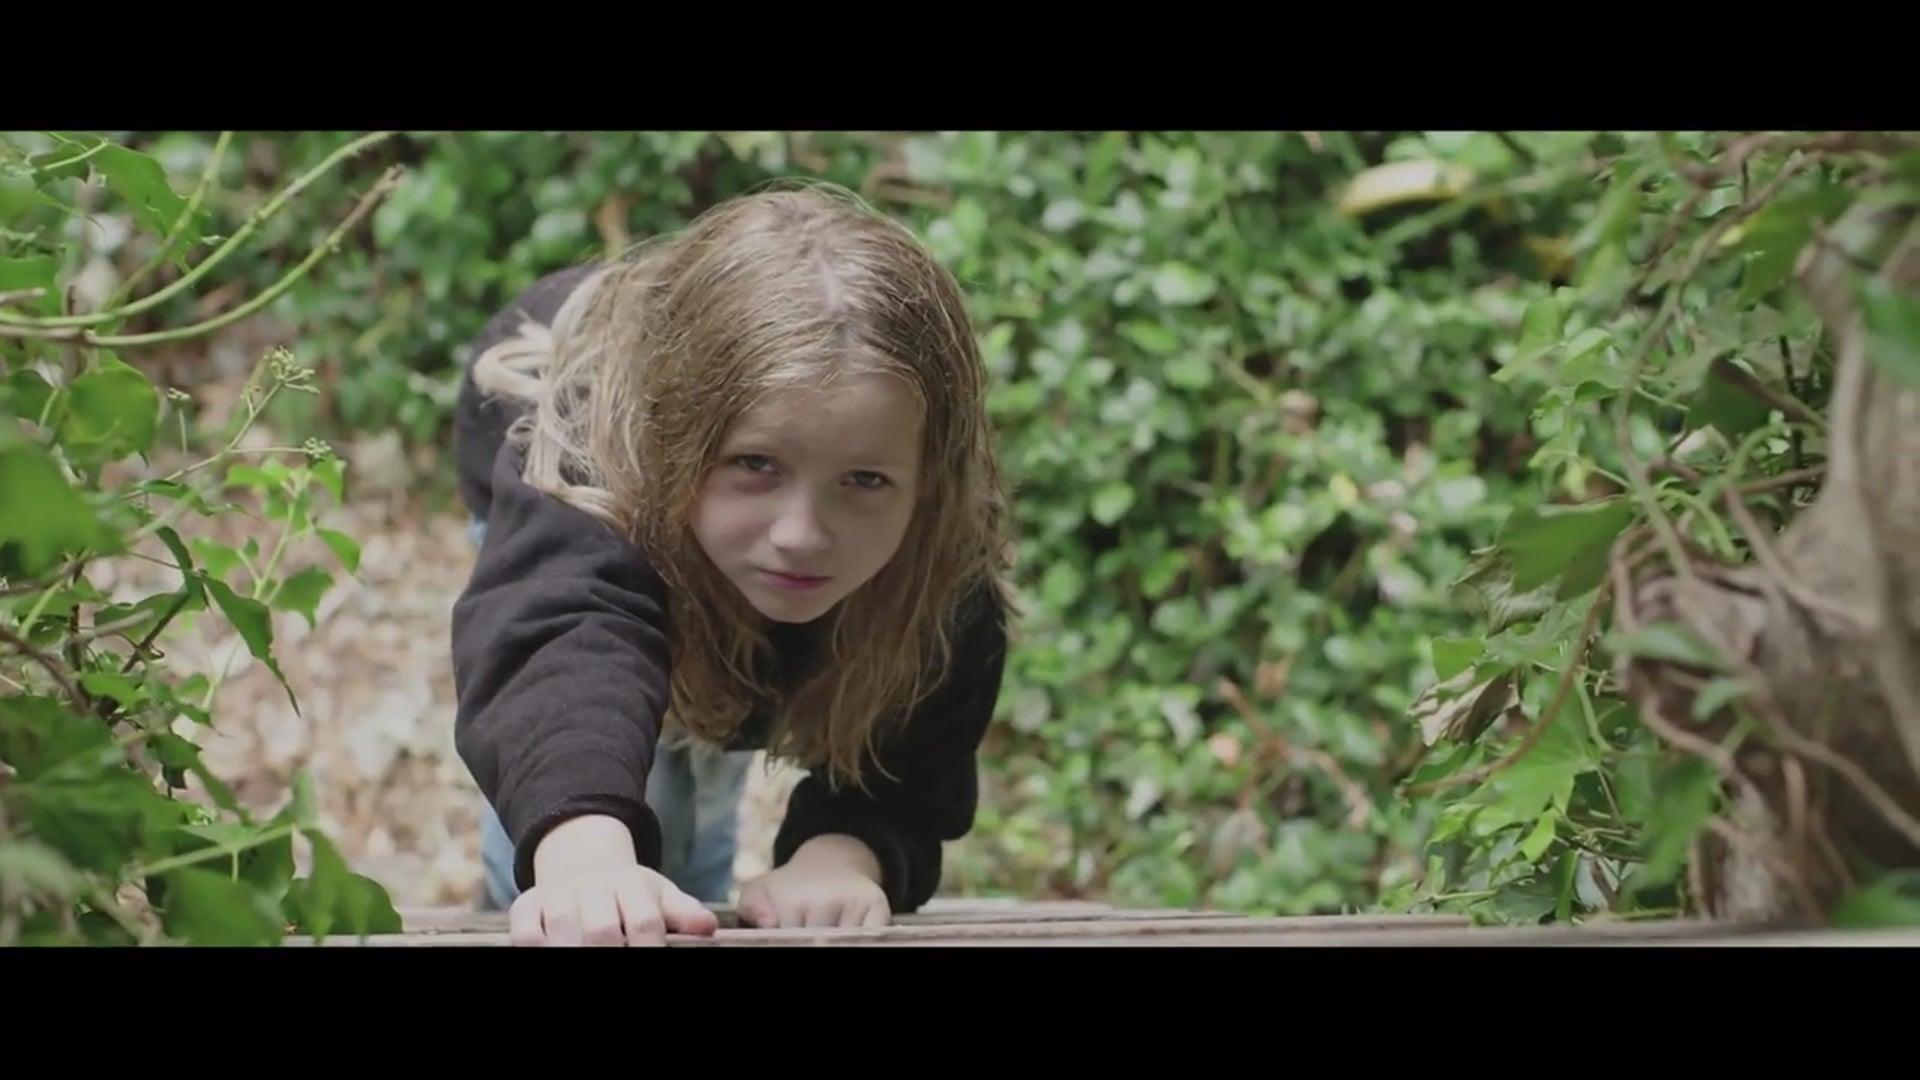 The Watchman's Canoe Concept Trailer